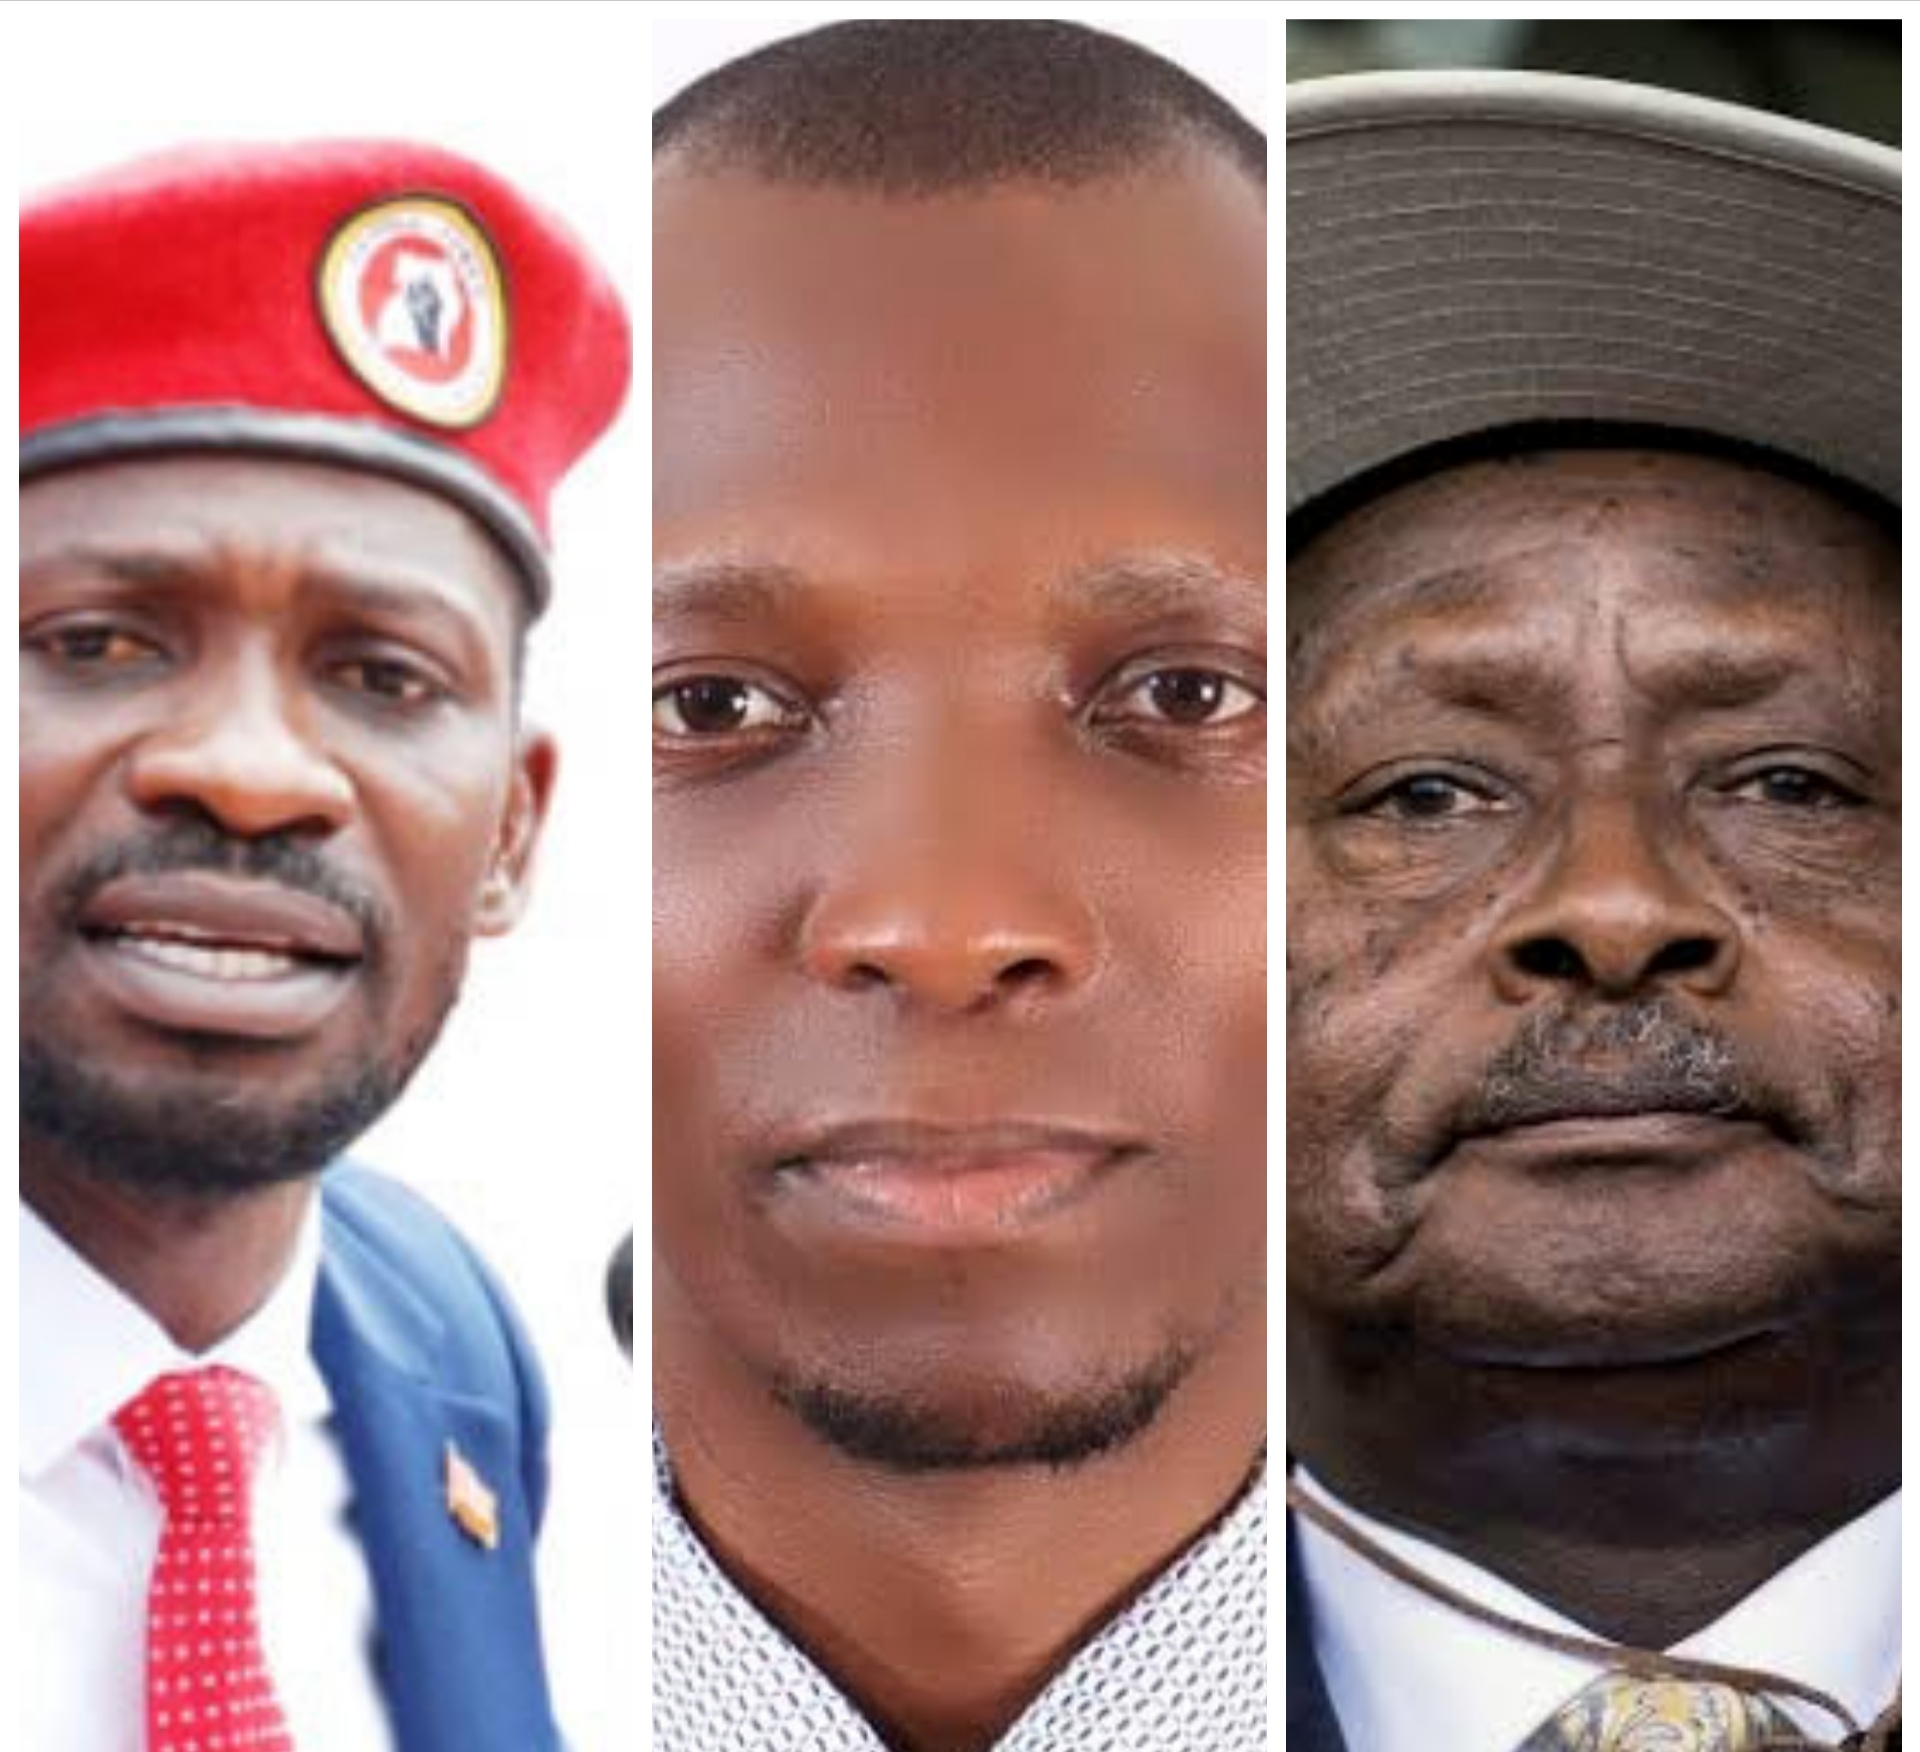 Bobi Wine, Muwada Nkunyingi and President Museveni